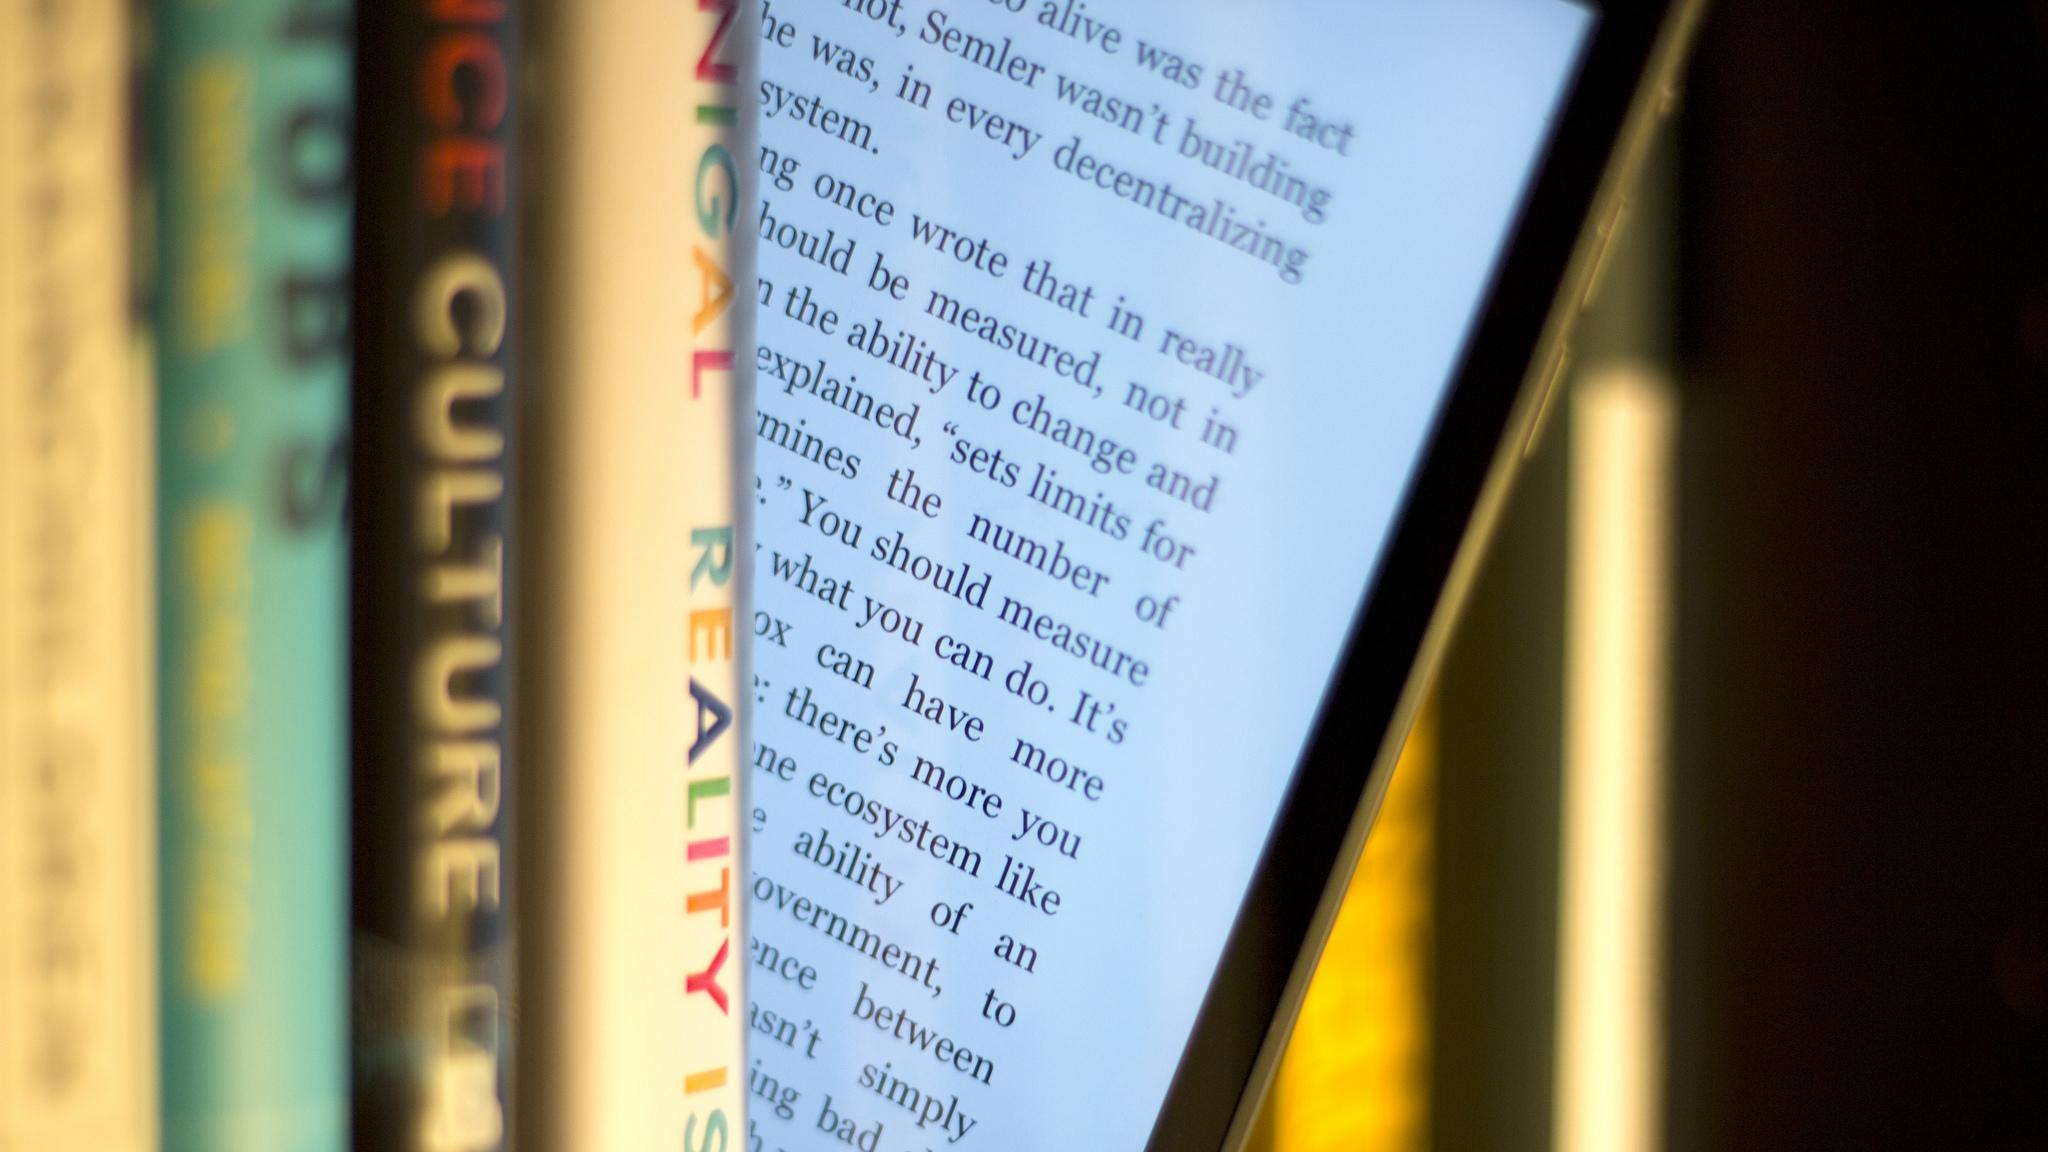 An ebook reader sticks out from a shelf full of books.